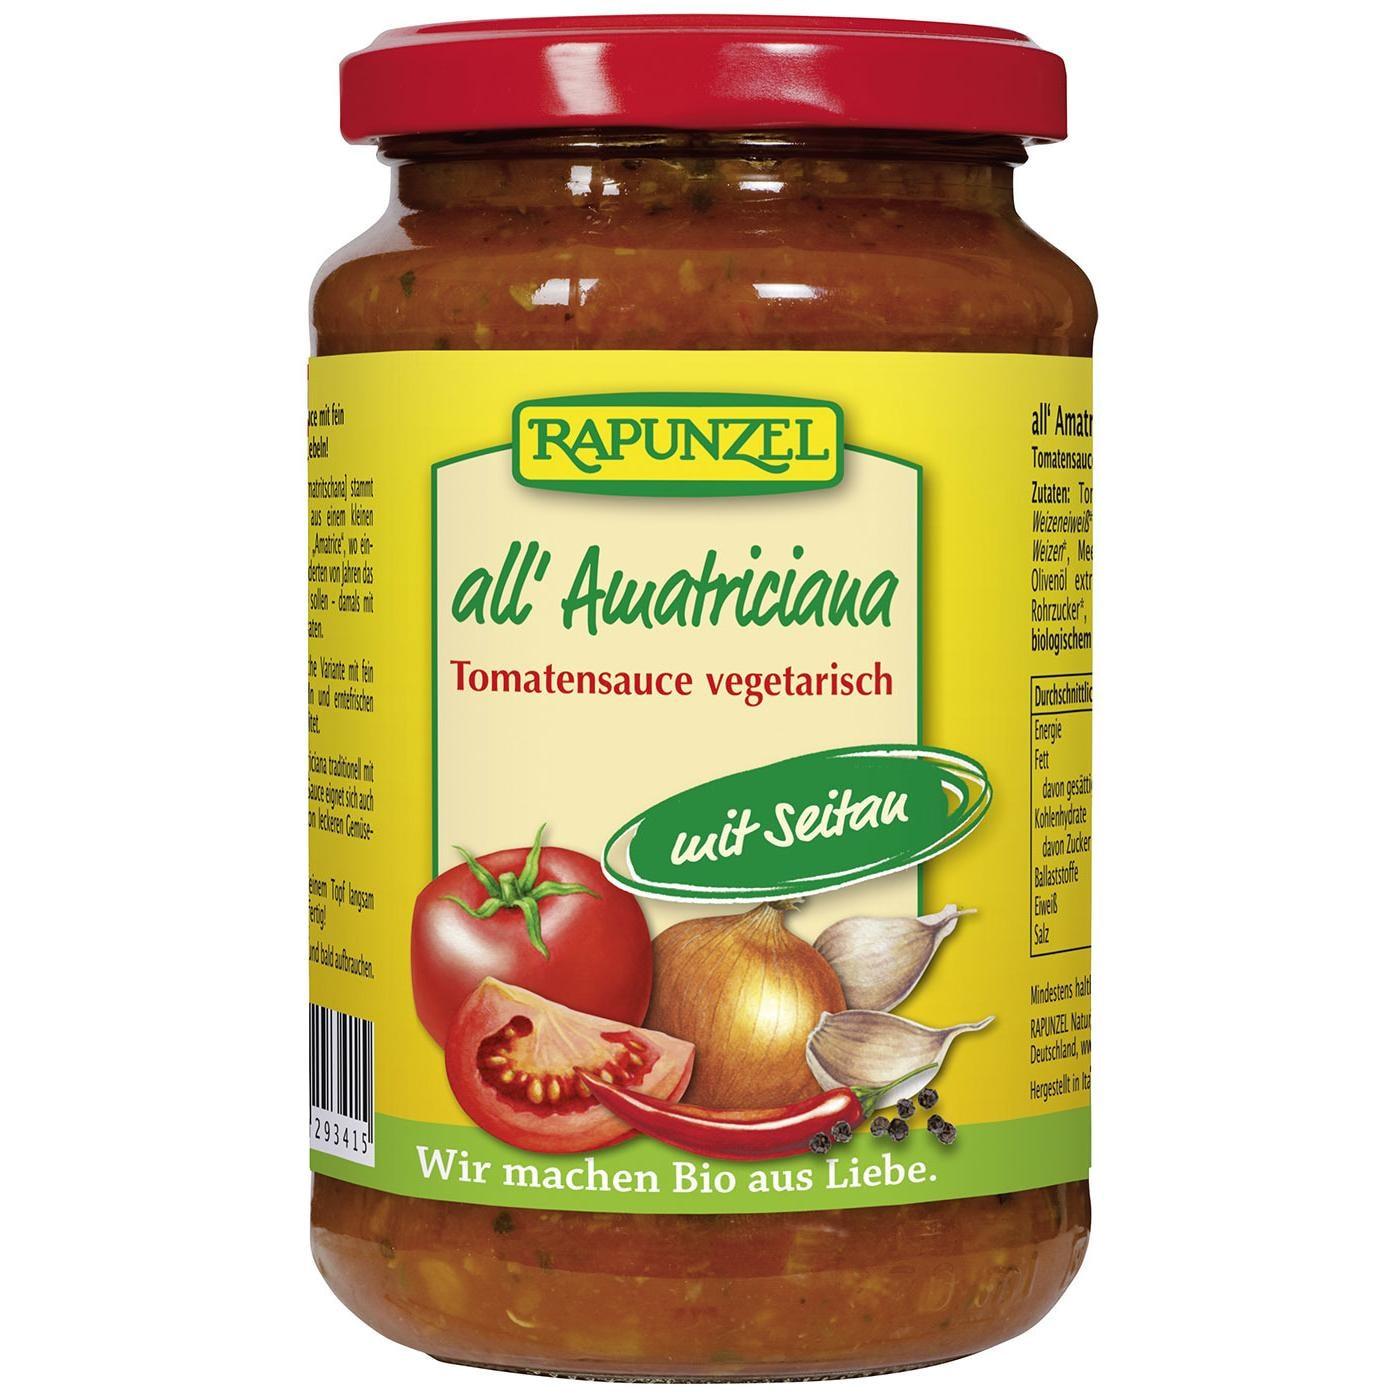 Rapunzel Bio Tomatensauce all Amatriciana mit Seitan 330ml